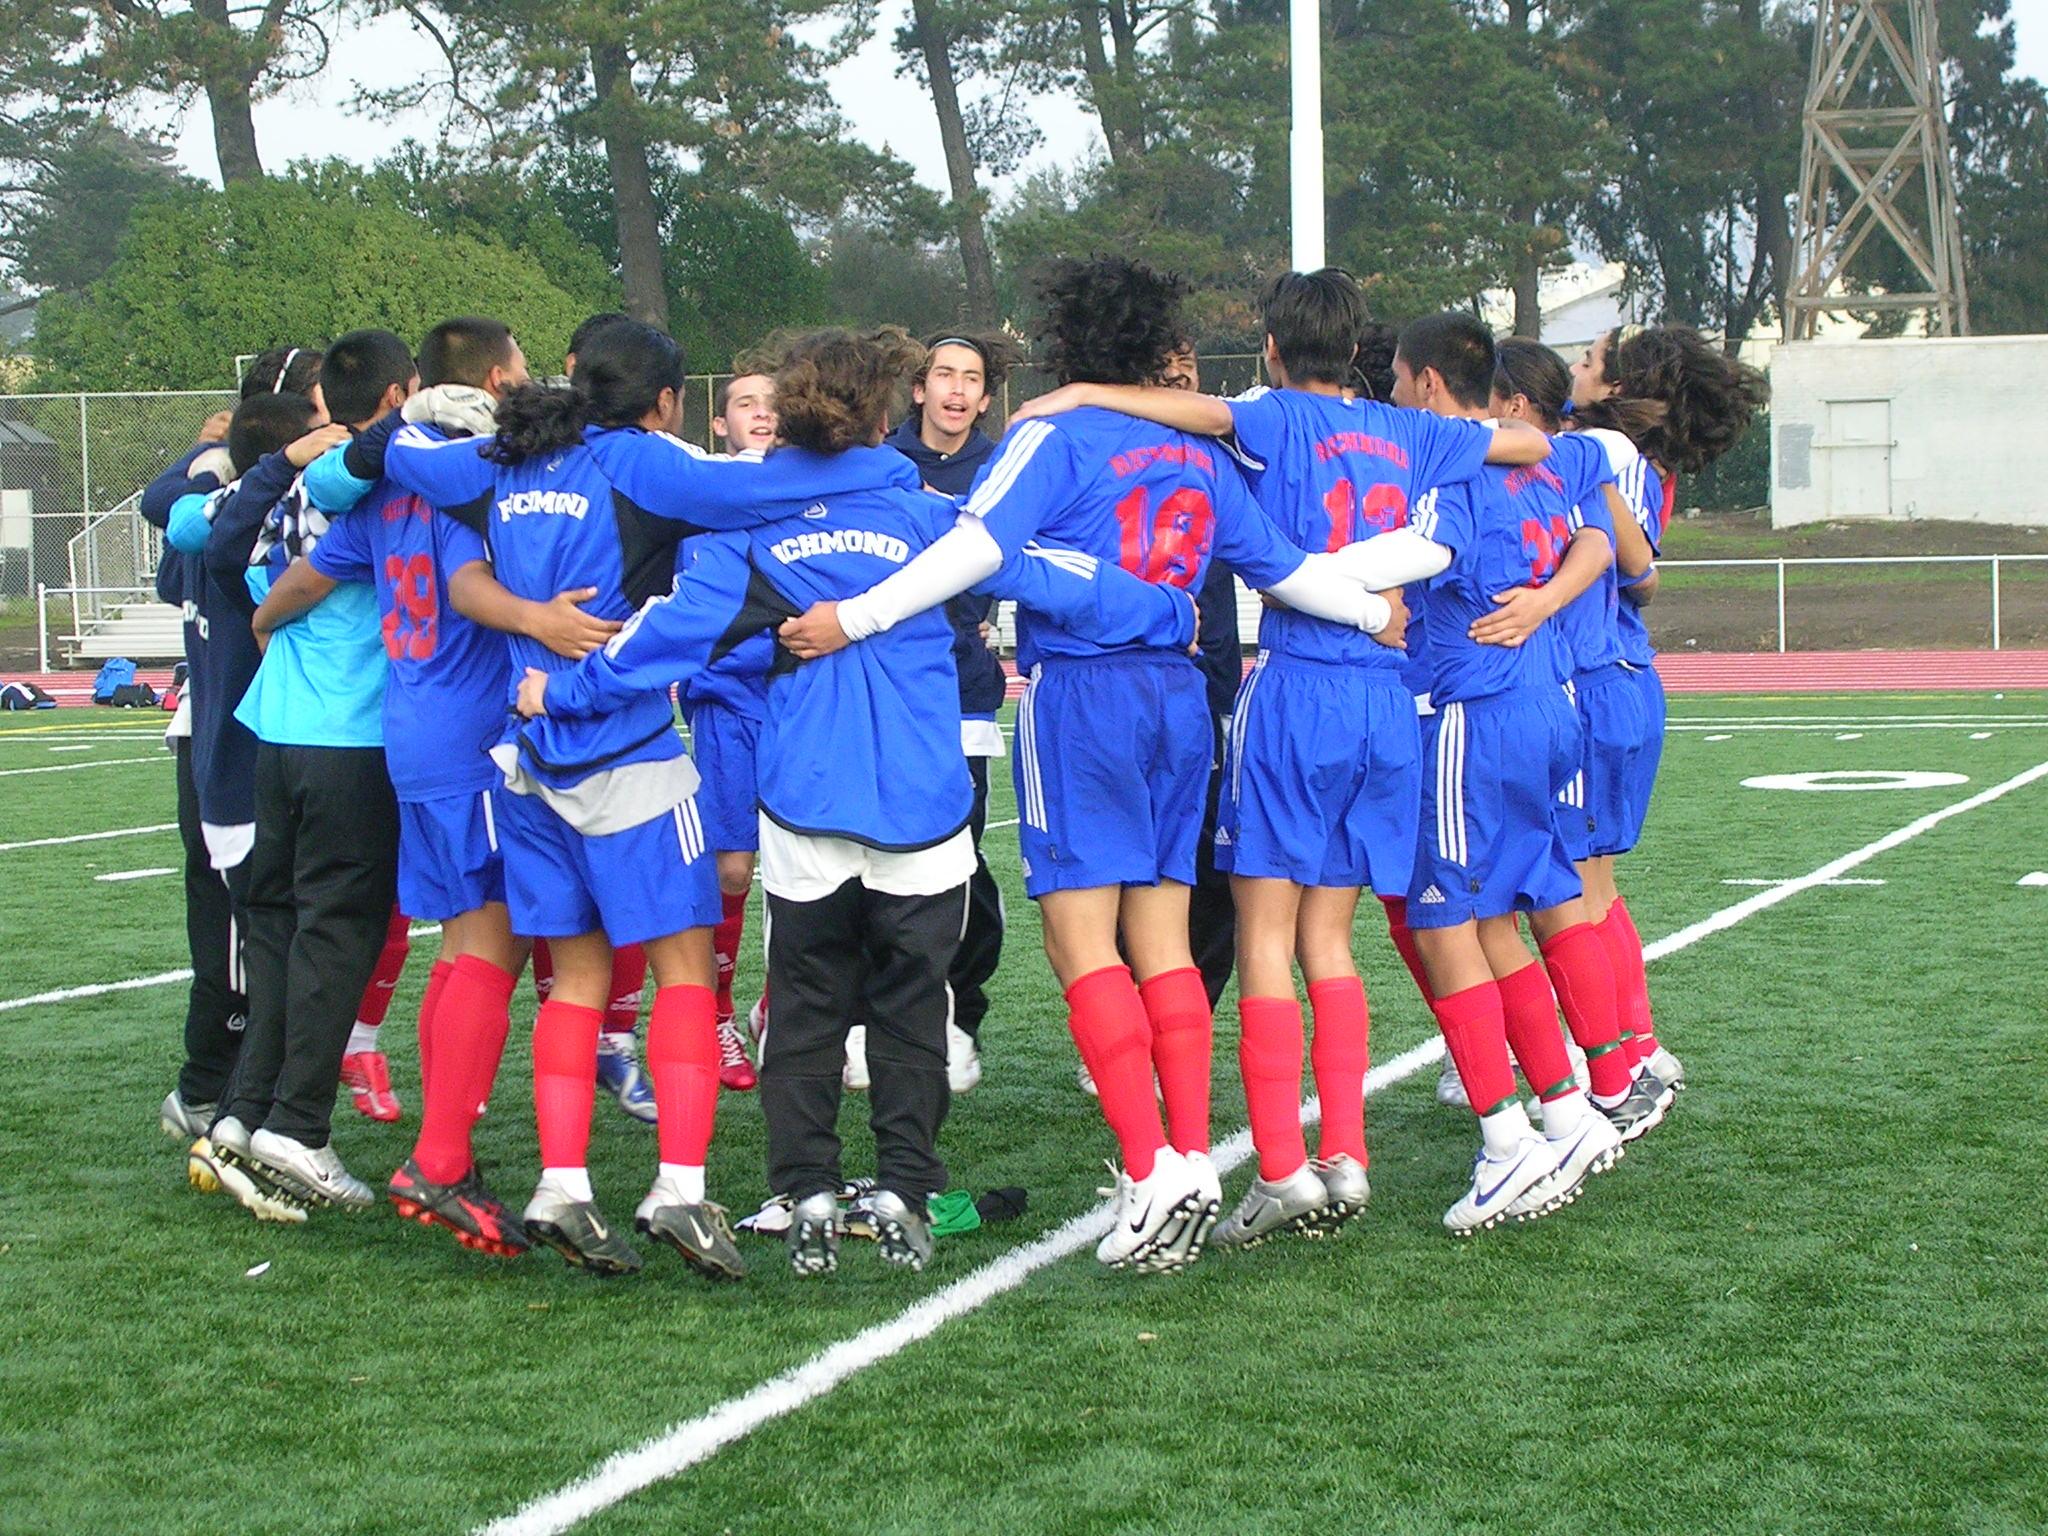 boys team chant pre-game 2-07.jpg